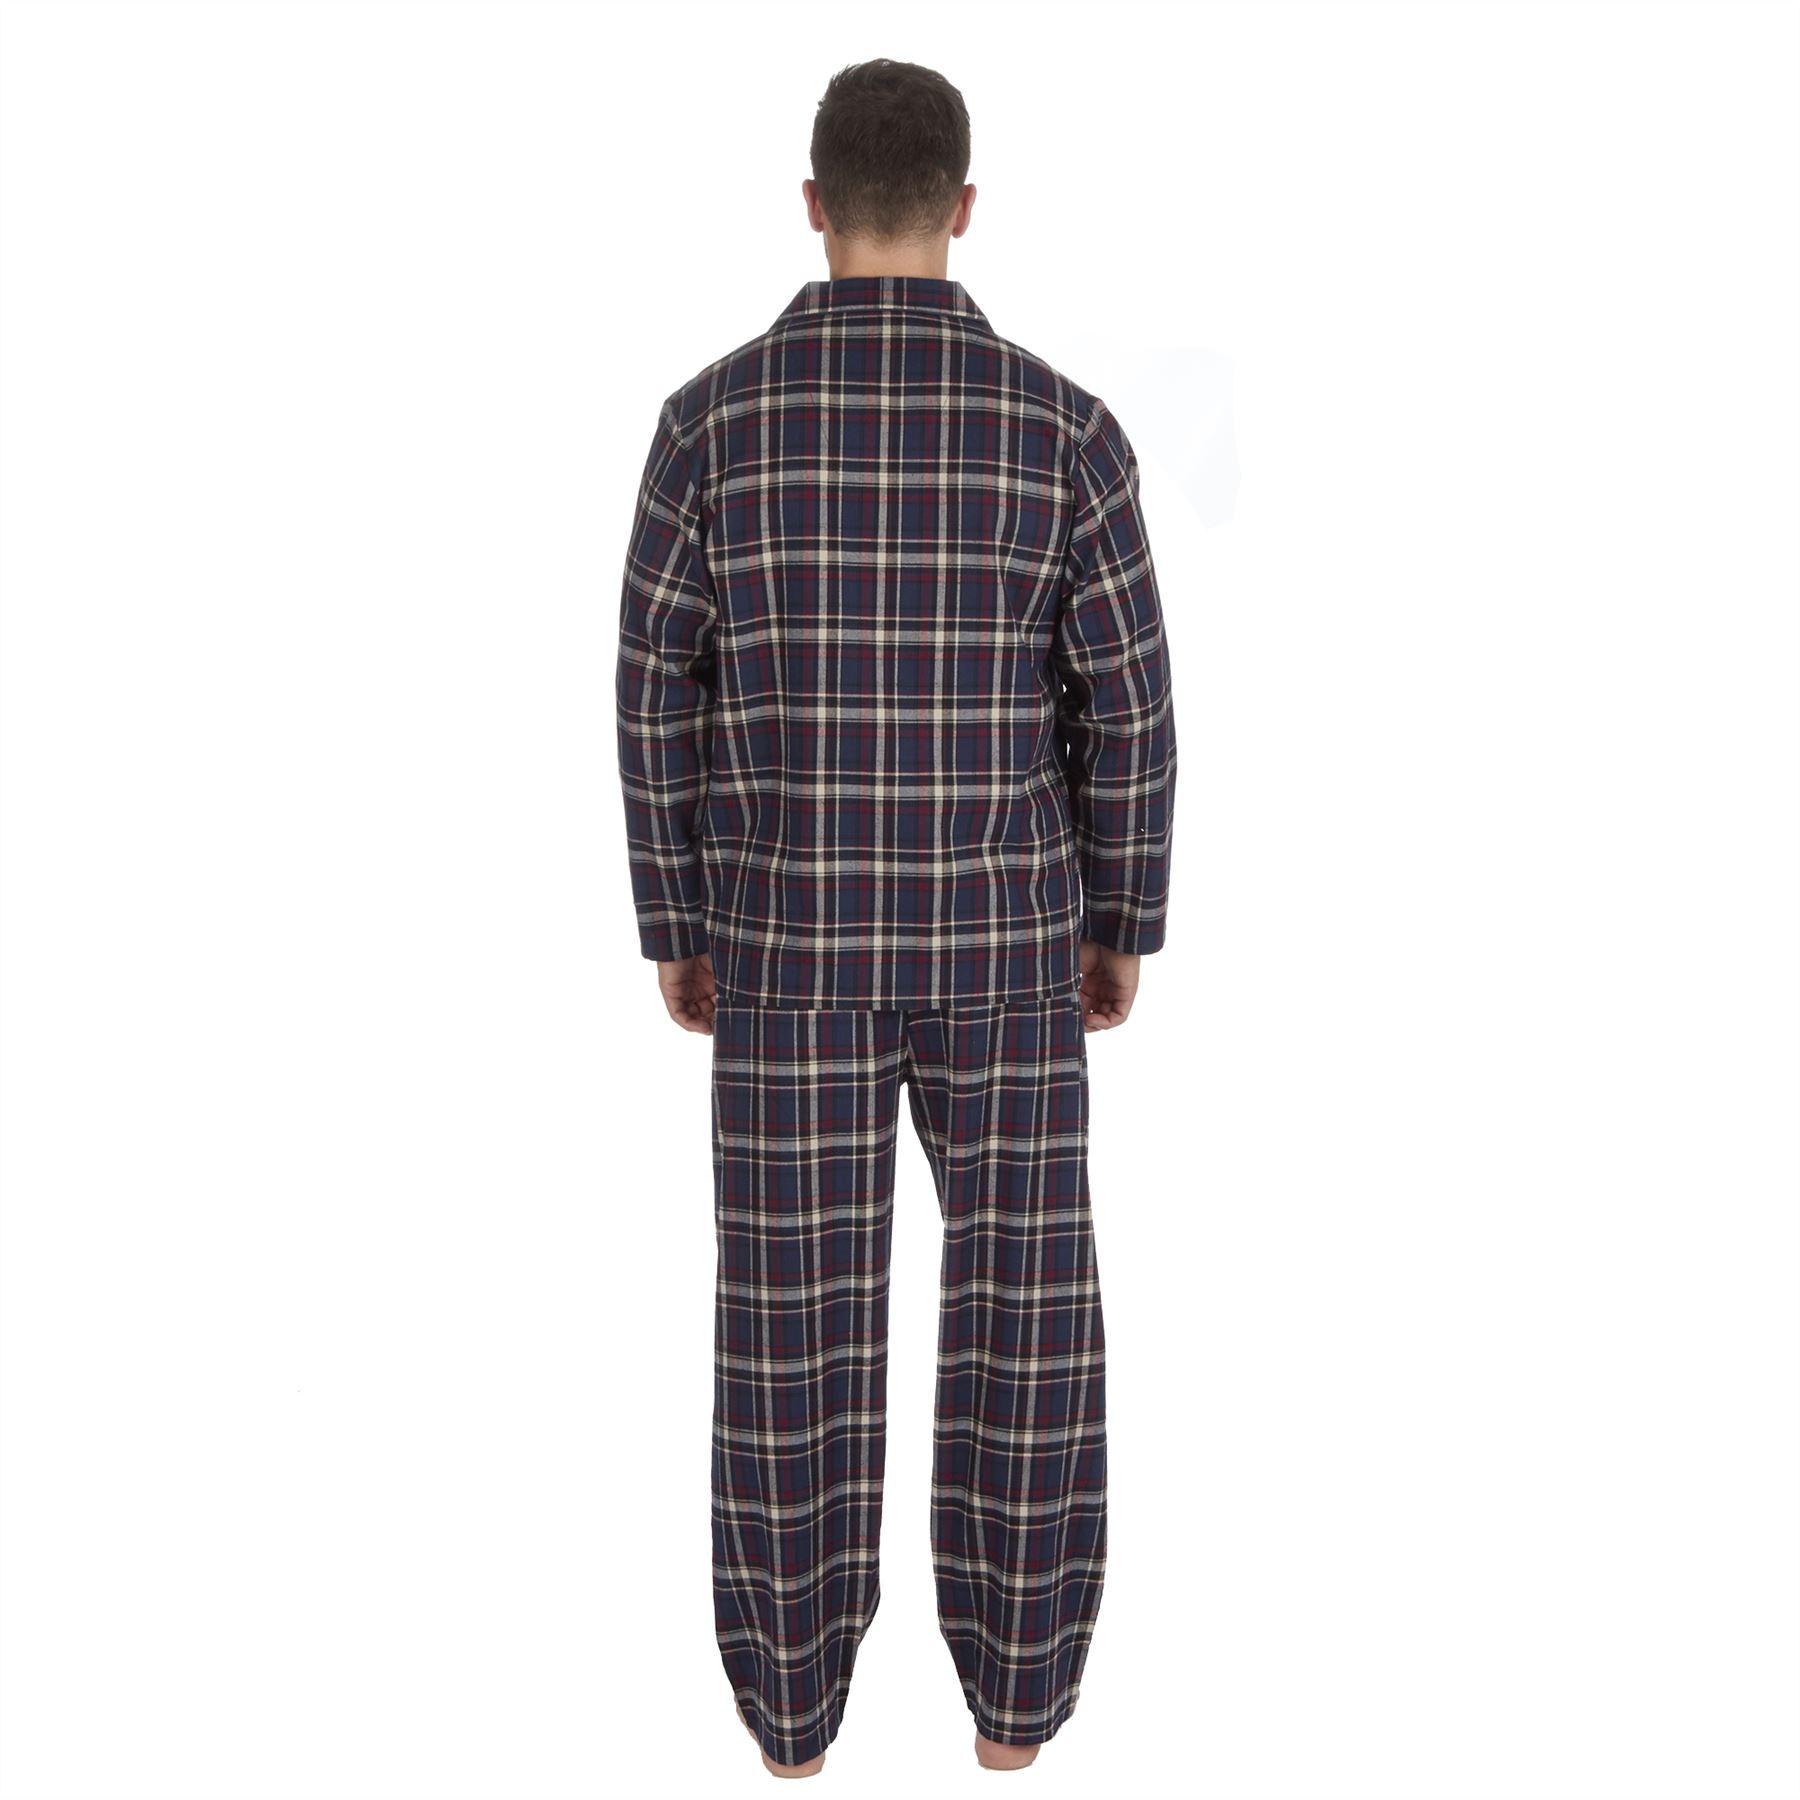 thumbnail 12 - Mens-Boys-100-Cotton-Flannel-Long-Sleeved-Pyjamas-Pyjama-Set-Check-Size-M-XXL